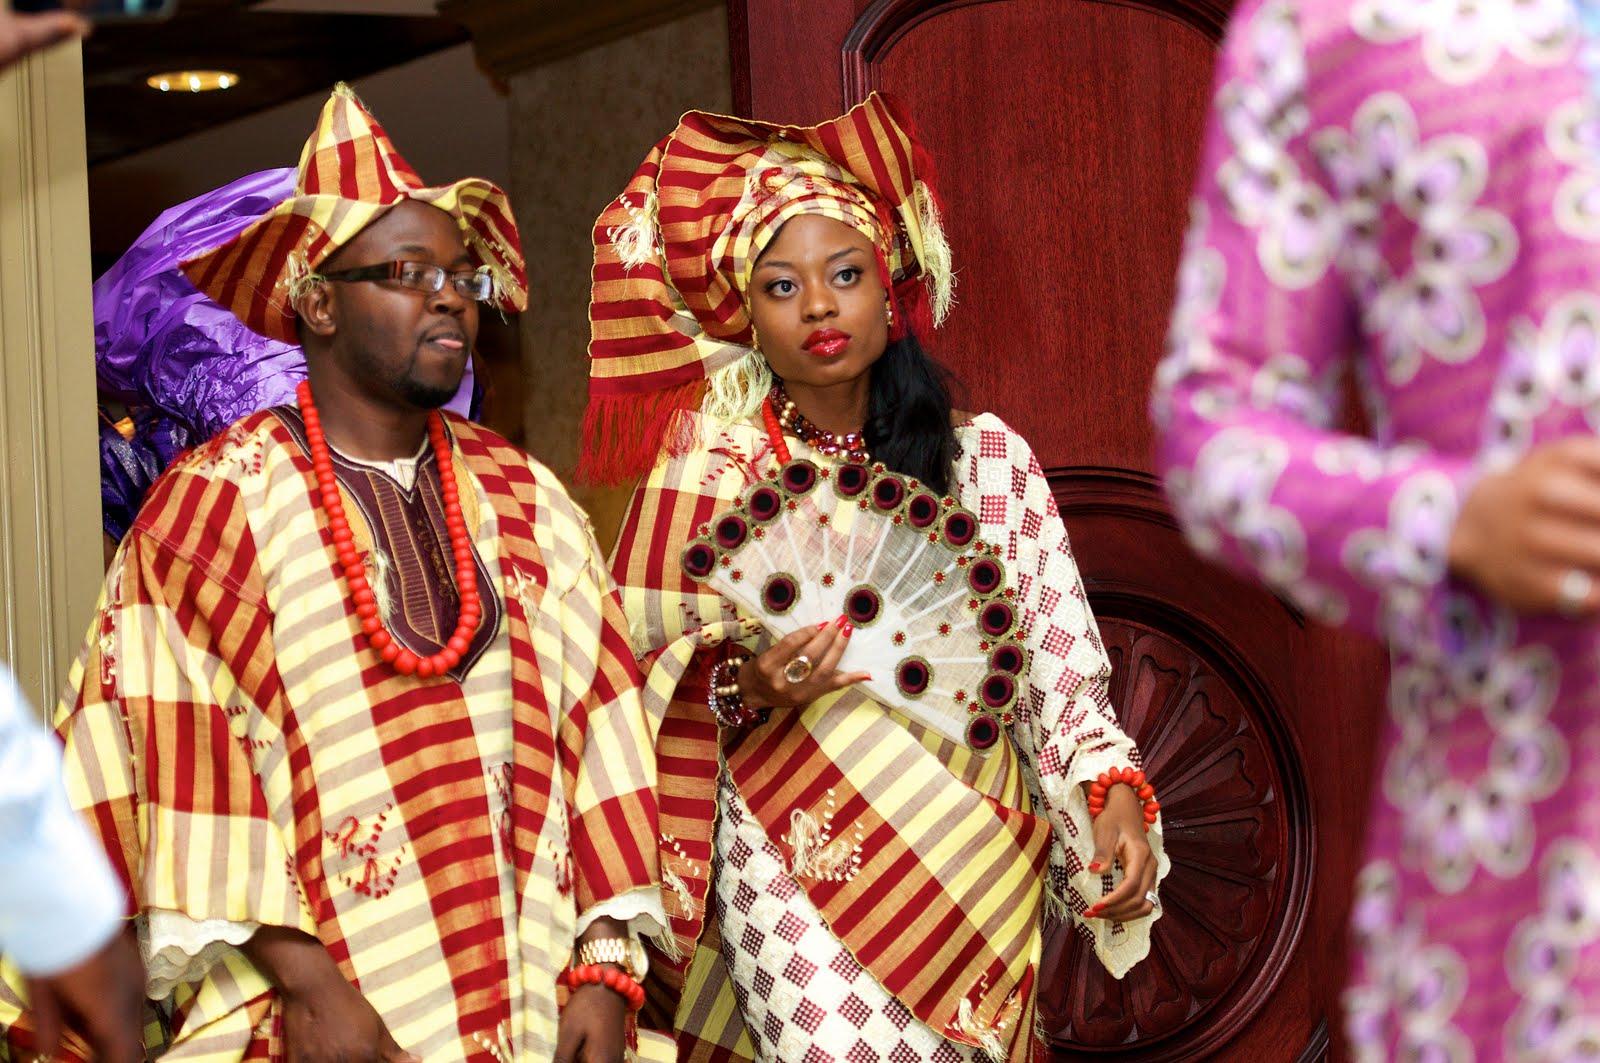 Beautylicious: Celebrating The Modern African Woman